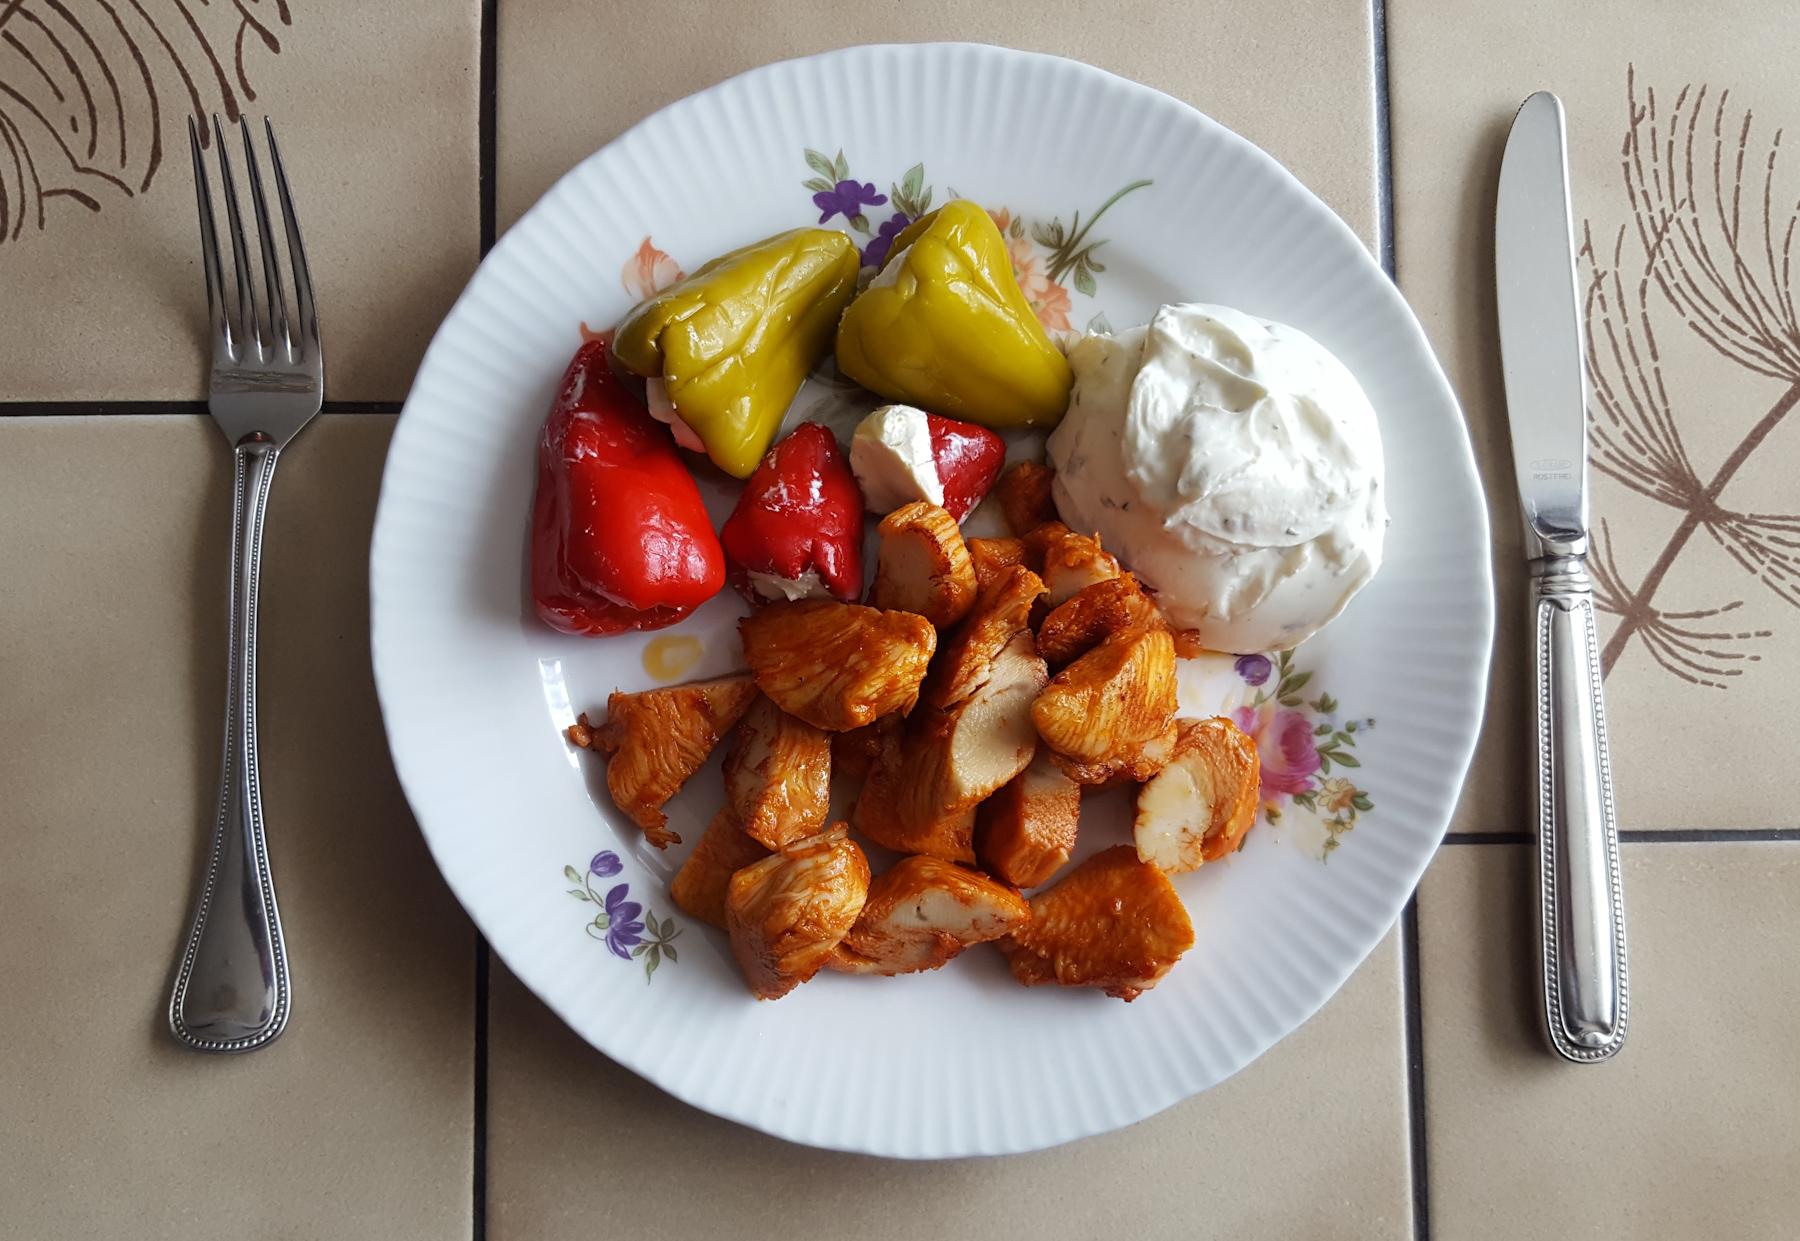 Hähnchenbrust-Filetstücke mit Antipasti (Paprika mit Frischkäse) und Kräuterquark